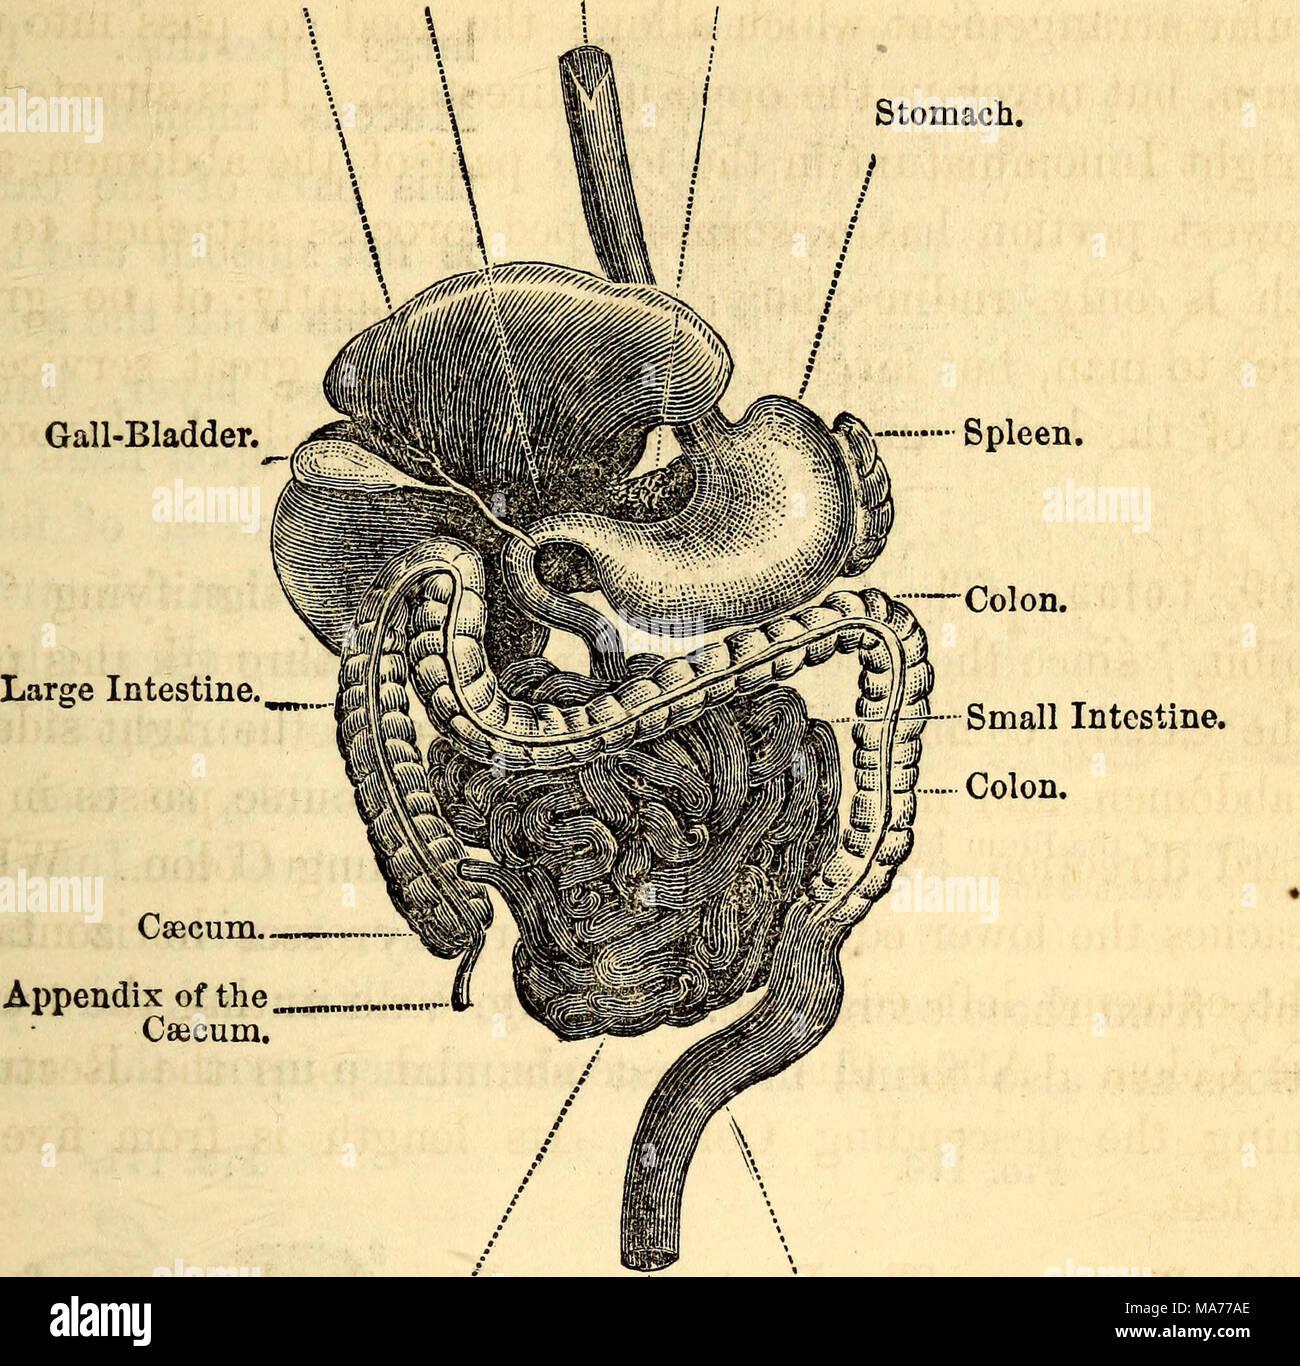 Digestive Apparatus Stockfotos & Digestive Apparatus Bilder - Alamy